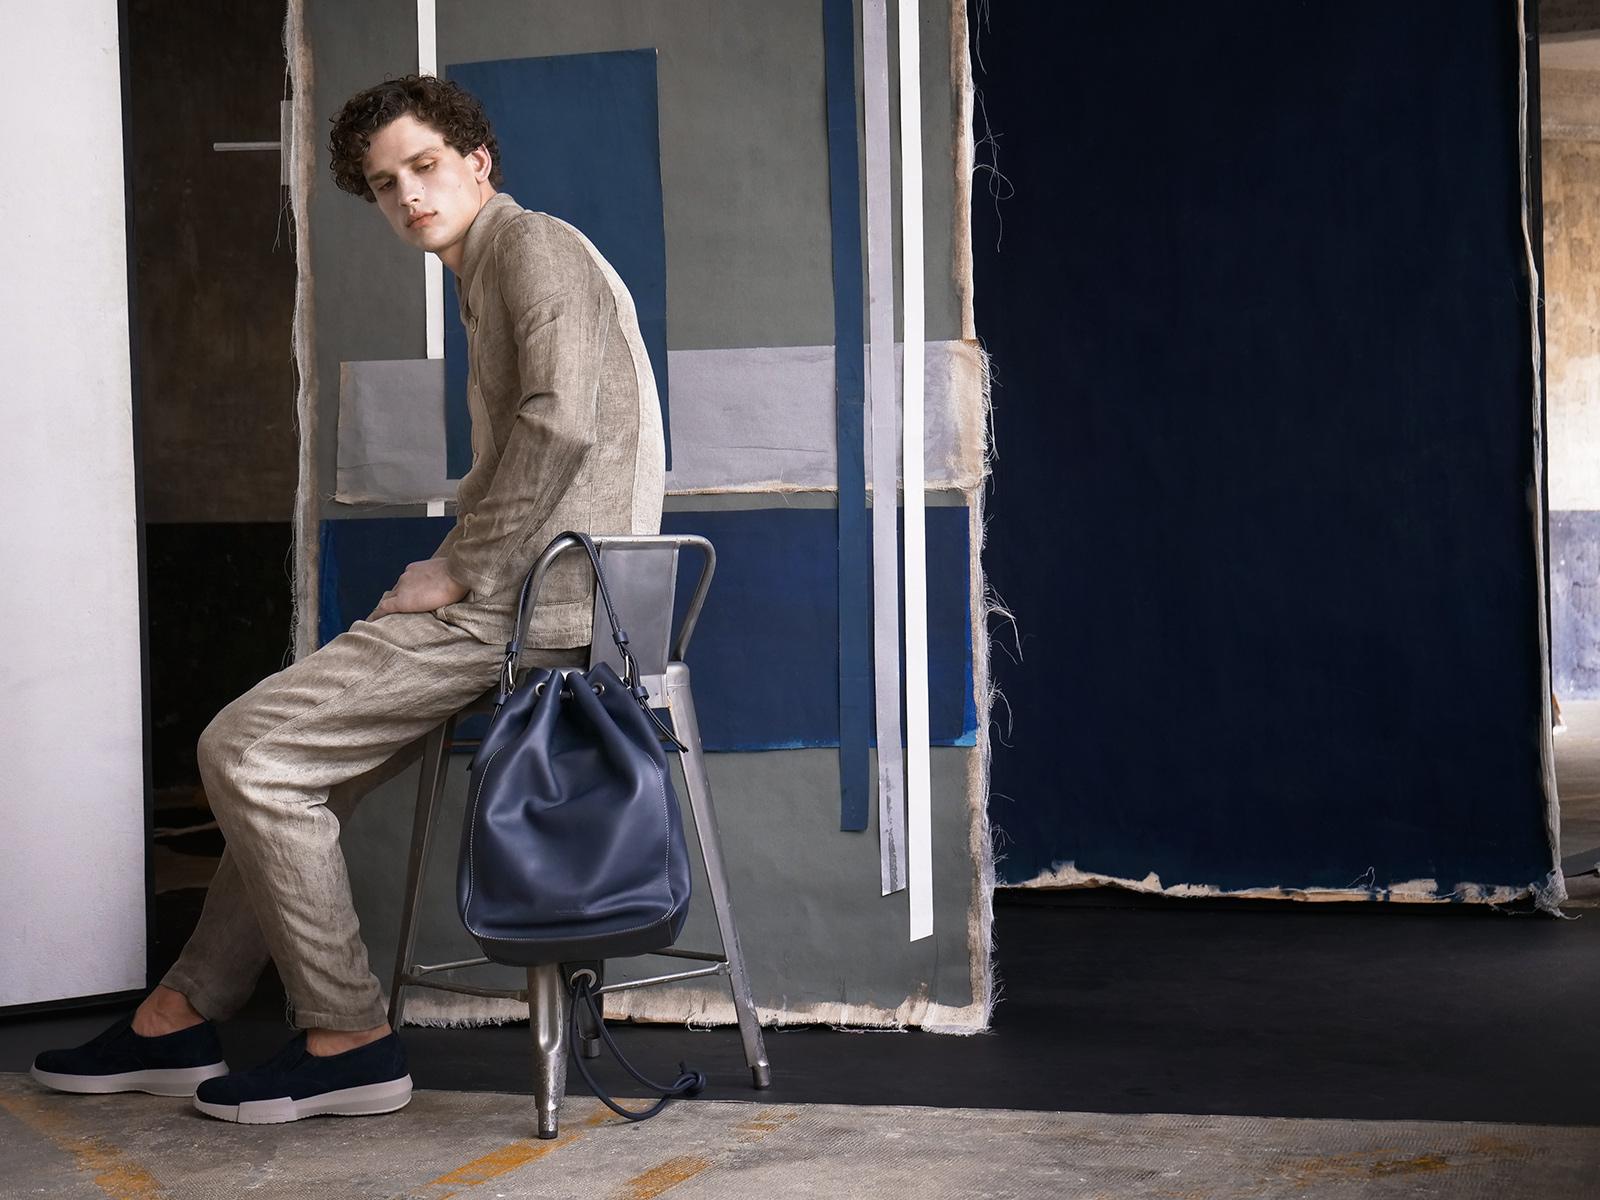 Simon-Nesman-Armani-fashion-04